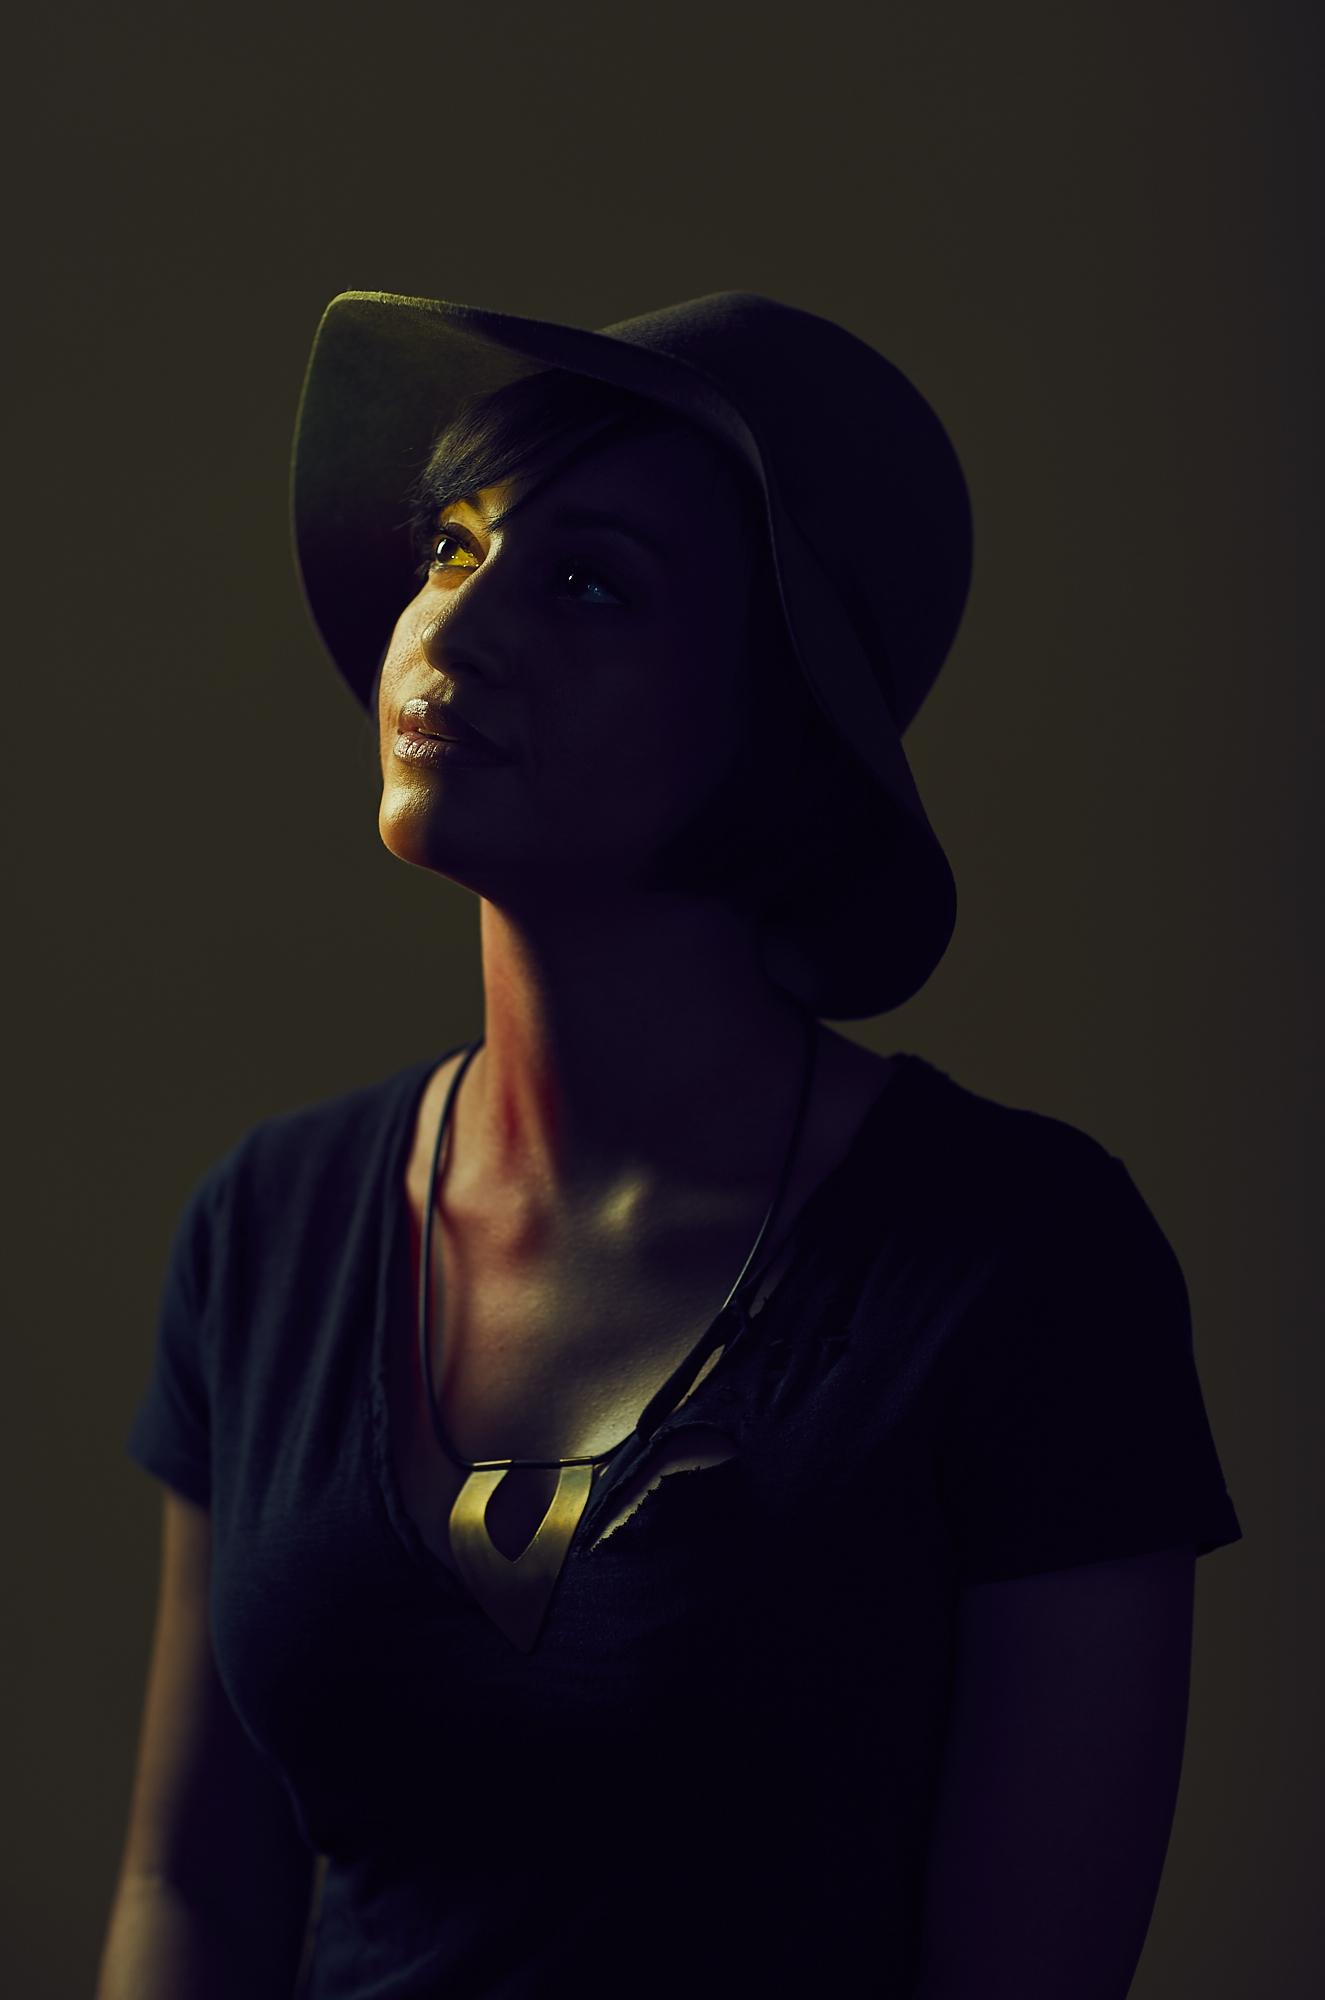 Portraits_12271_small.jpg